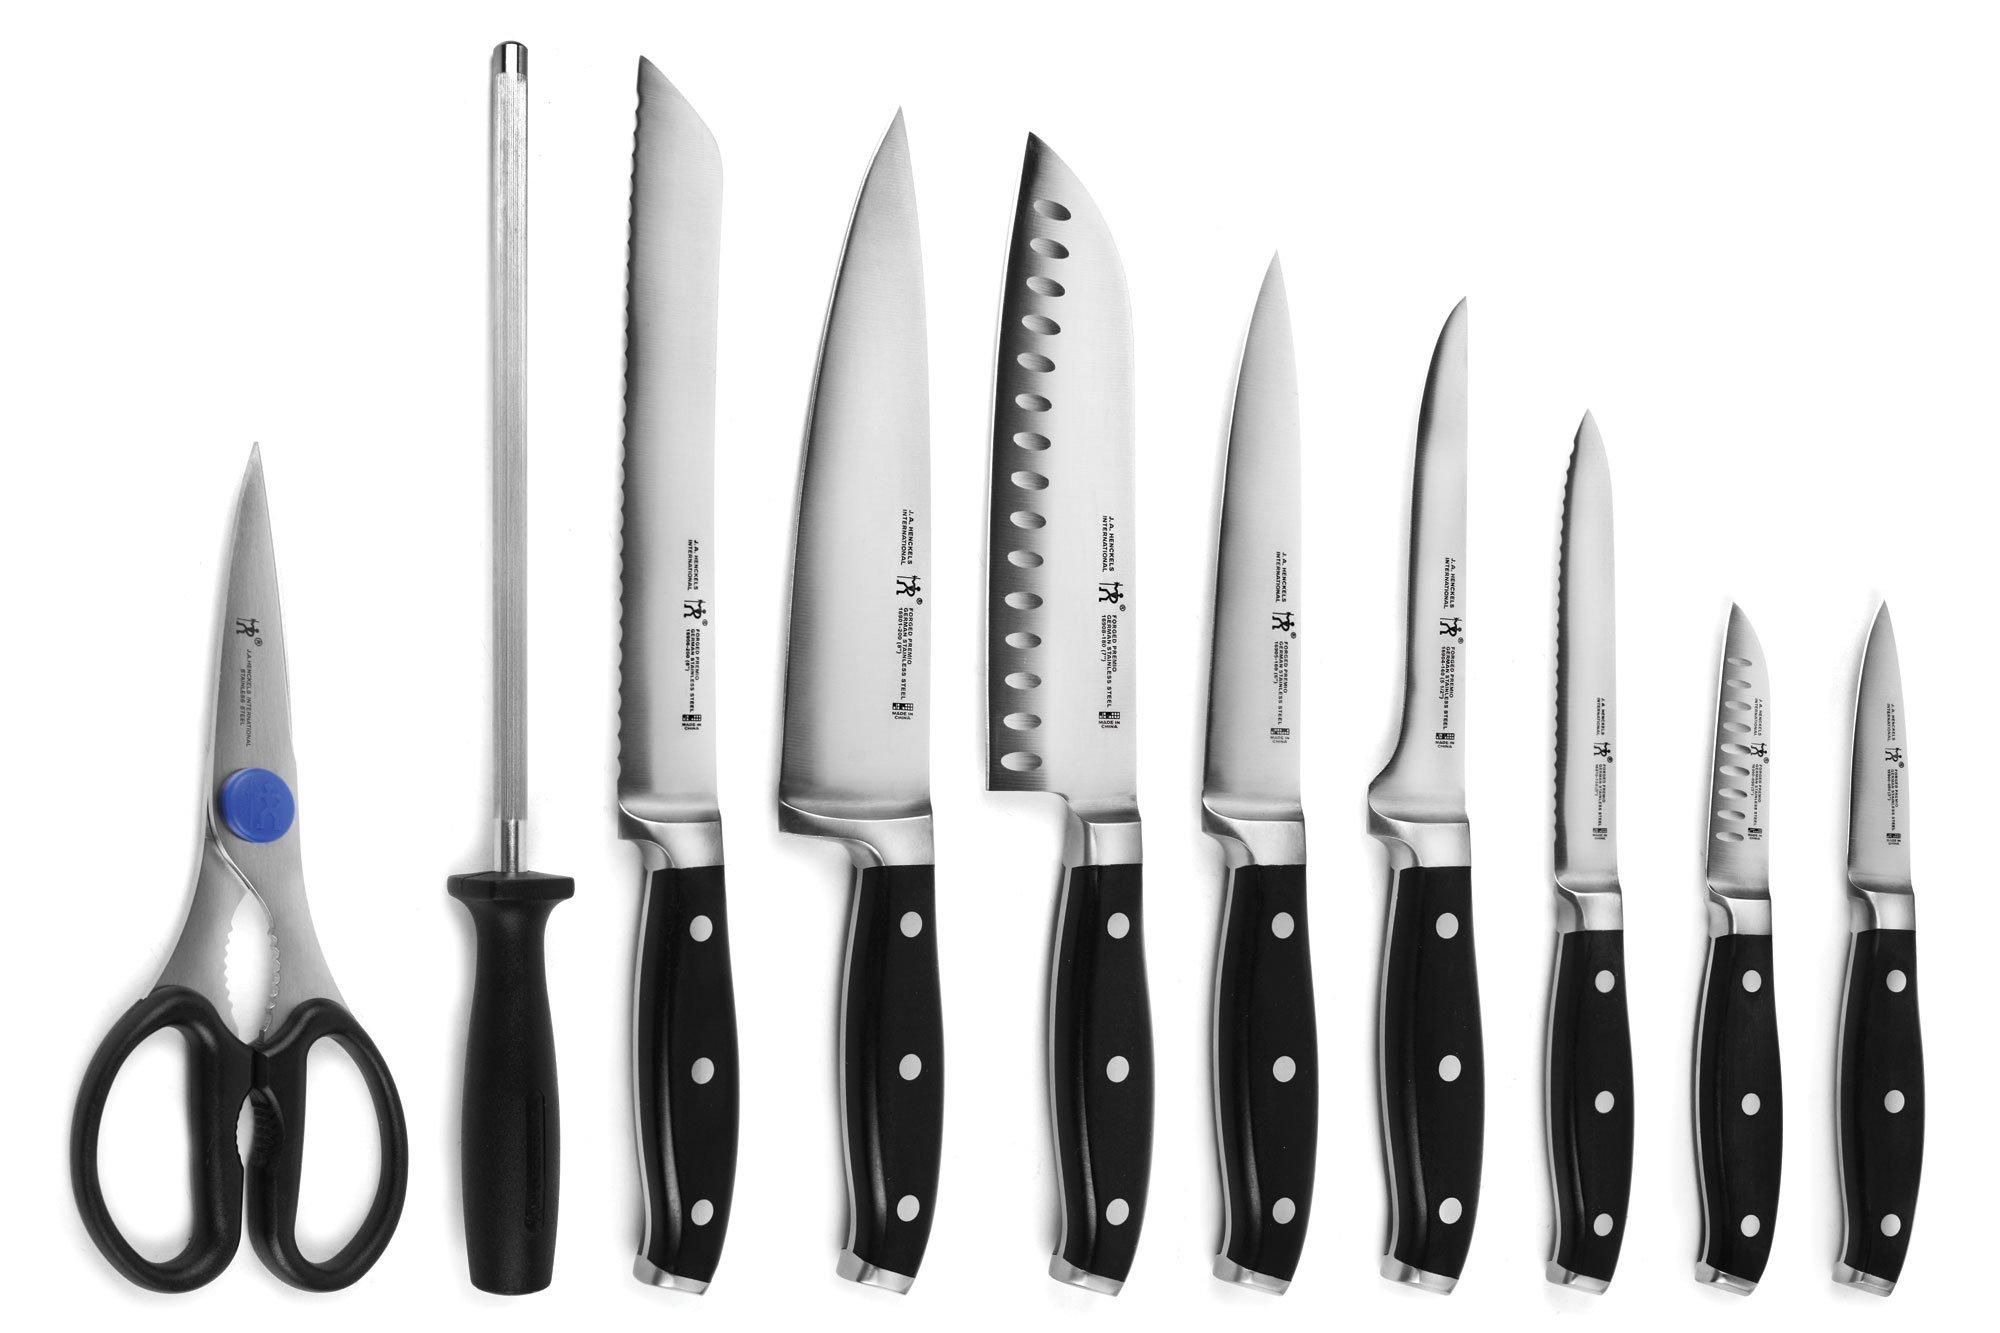 J.A. Henckels International Forged Premio 19-piece Knife Set with Cherry Block by Henckels (Image #2)